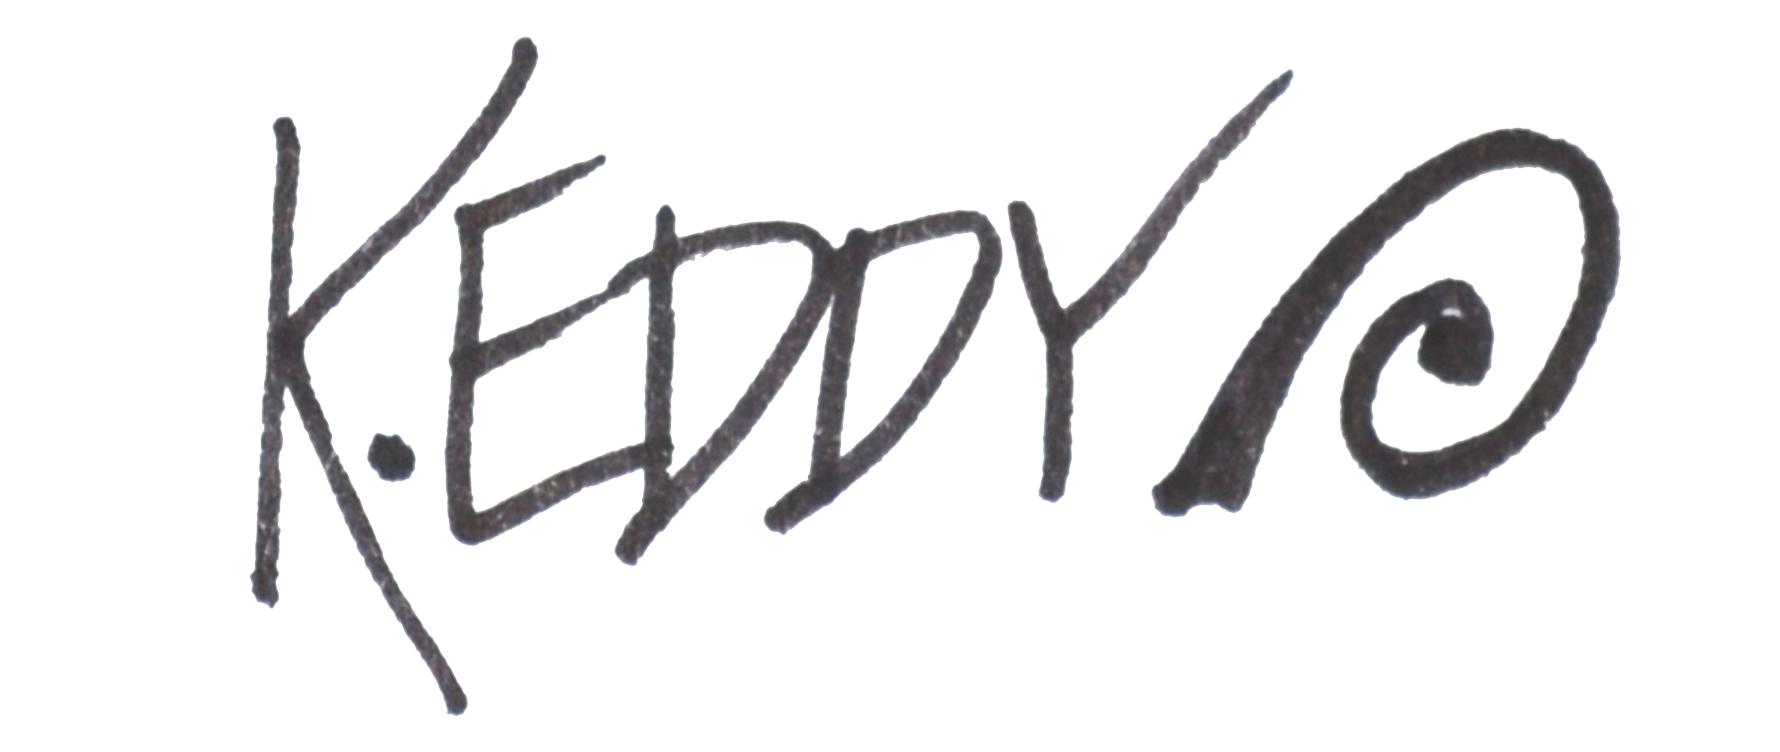 Kimberley Eddy's Signature